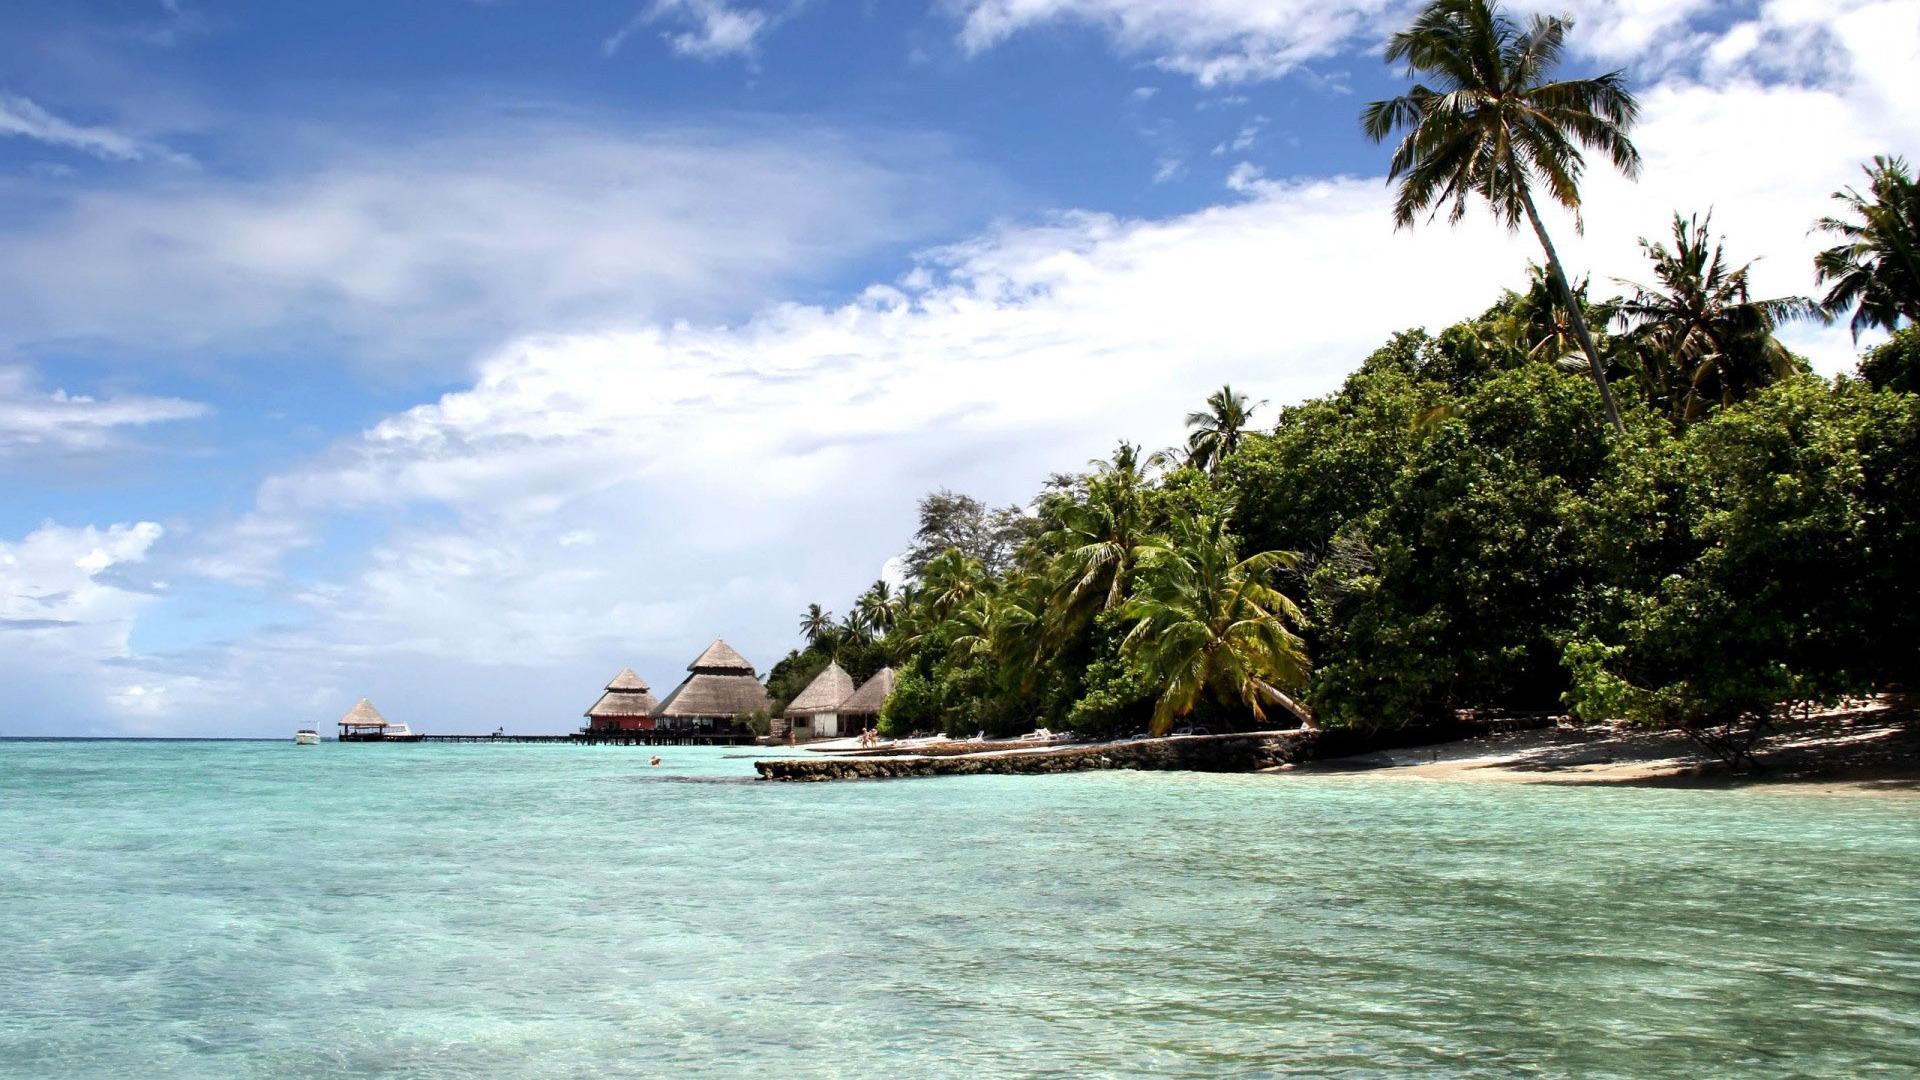 Tropical island wallpaper 10130 1920x1080